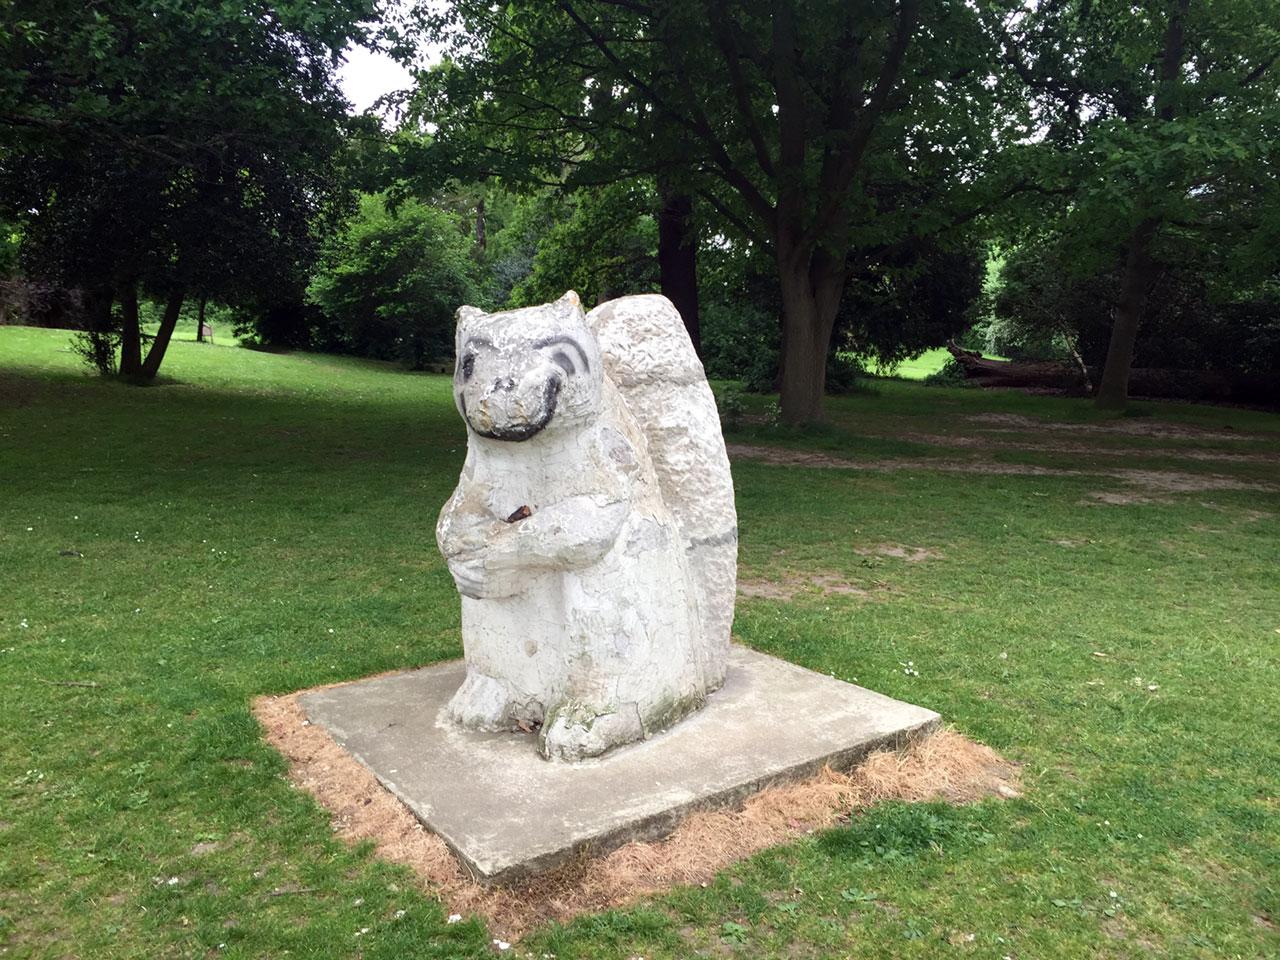 Squirrel sculpture, Beckenham Place Park